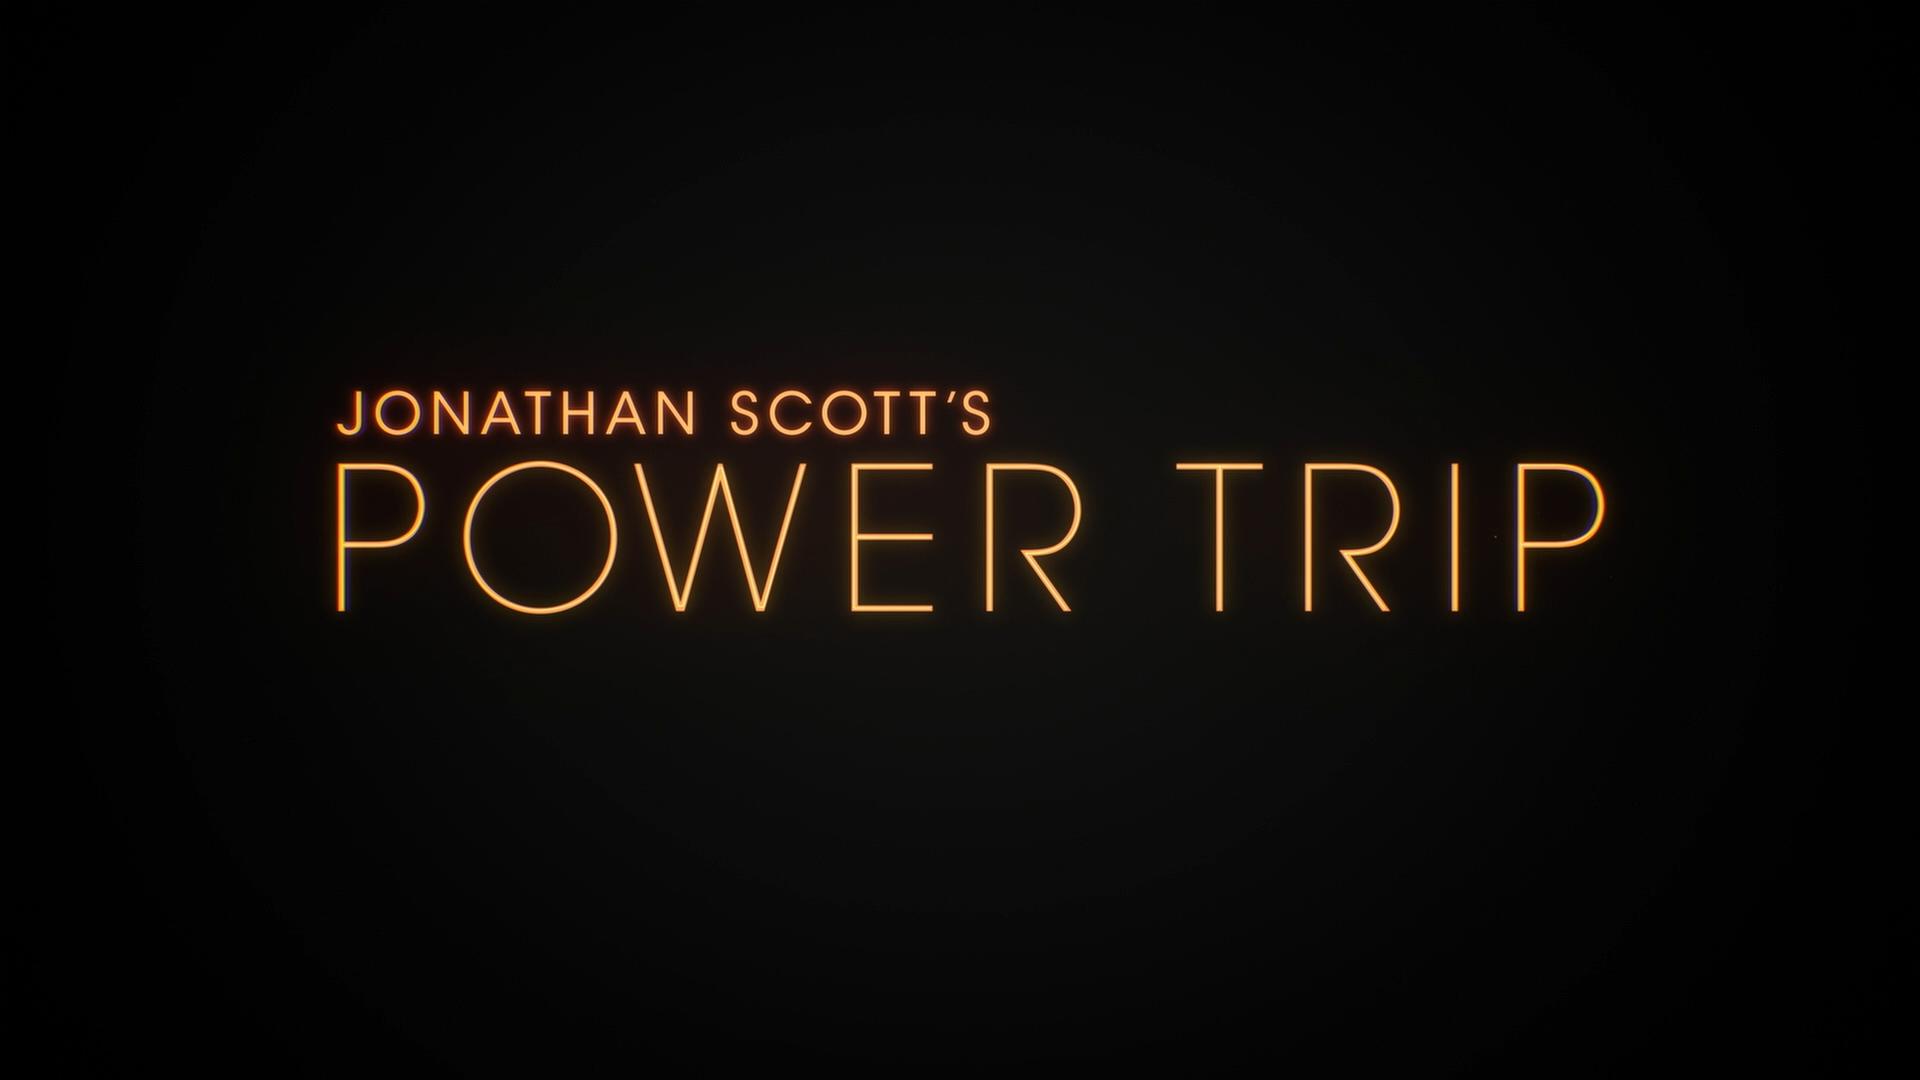 jonathan scotts power trip title card